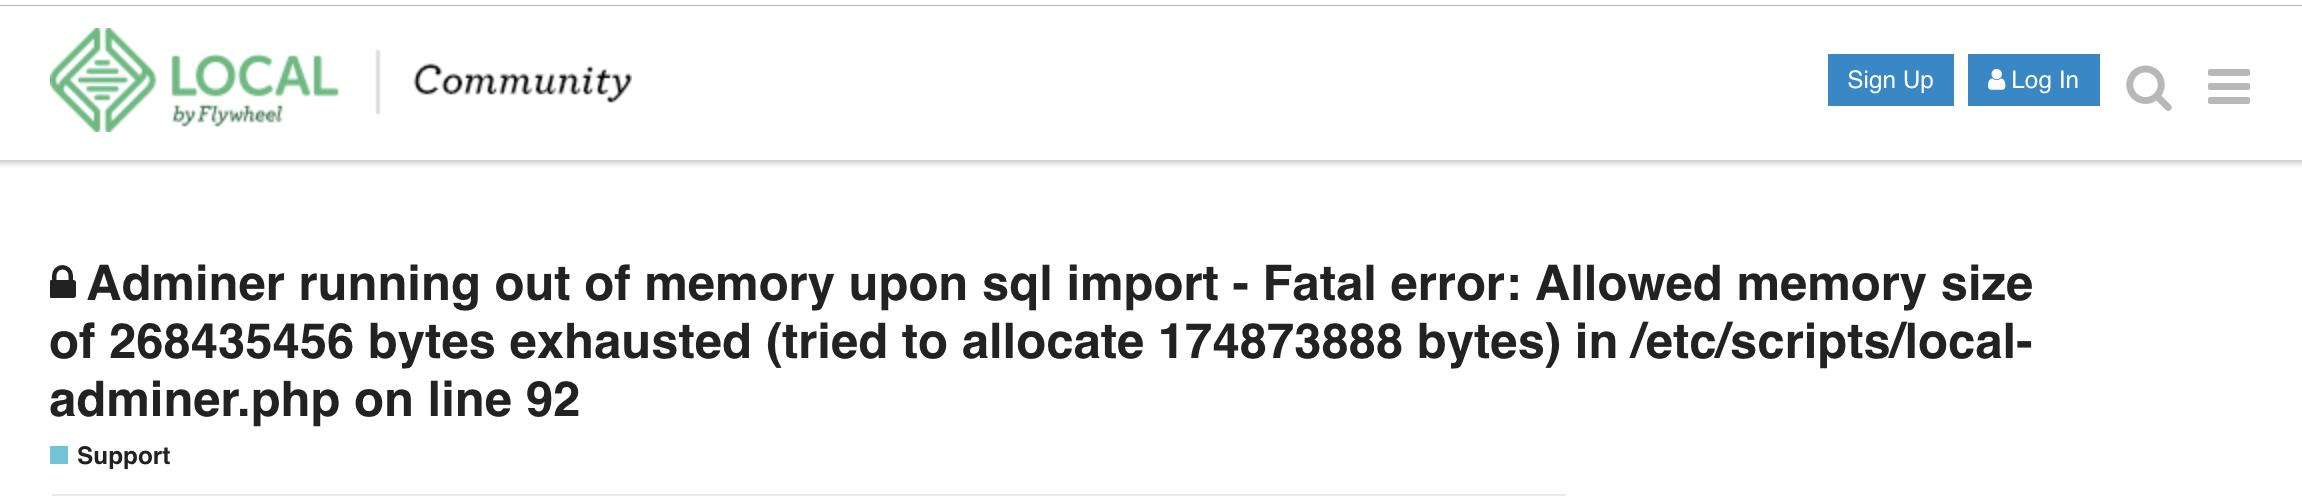 flywheel adminer running out of memory upon sql import - fatal error